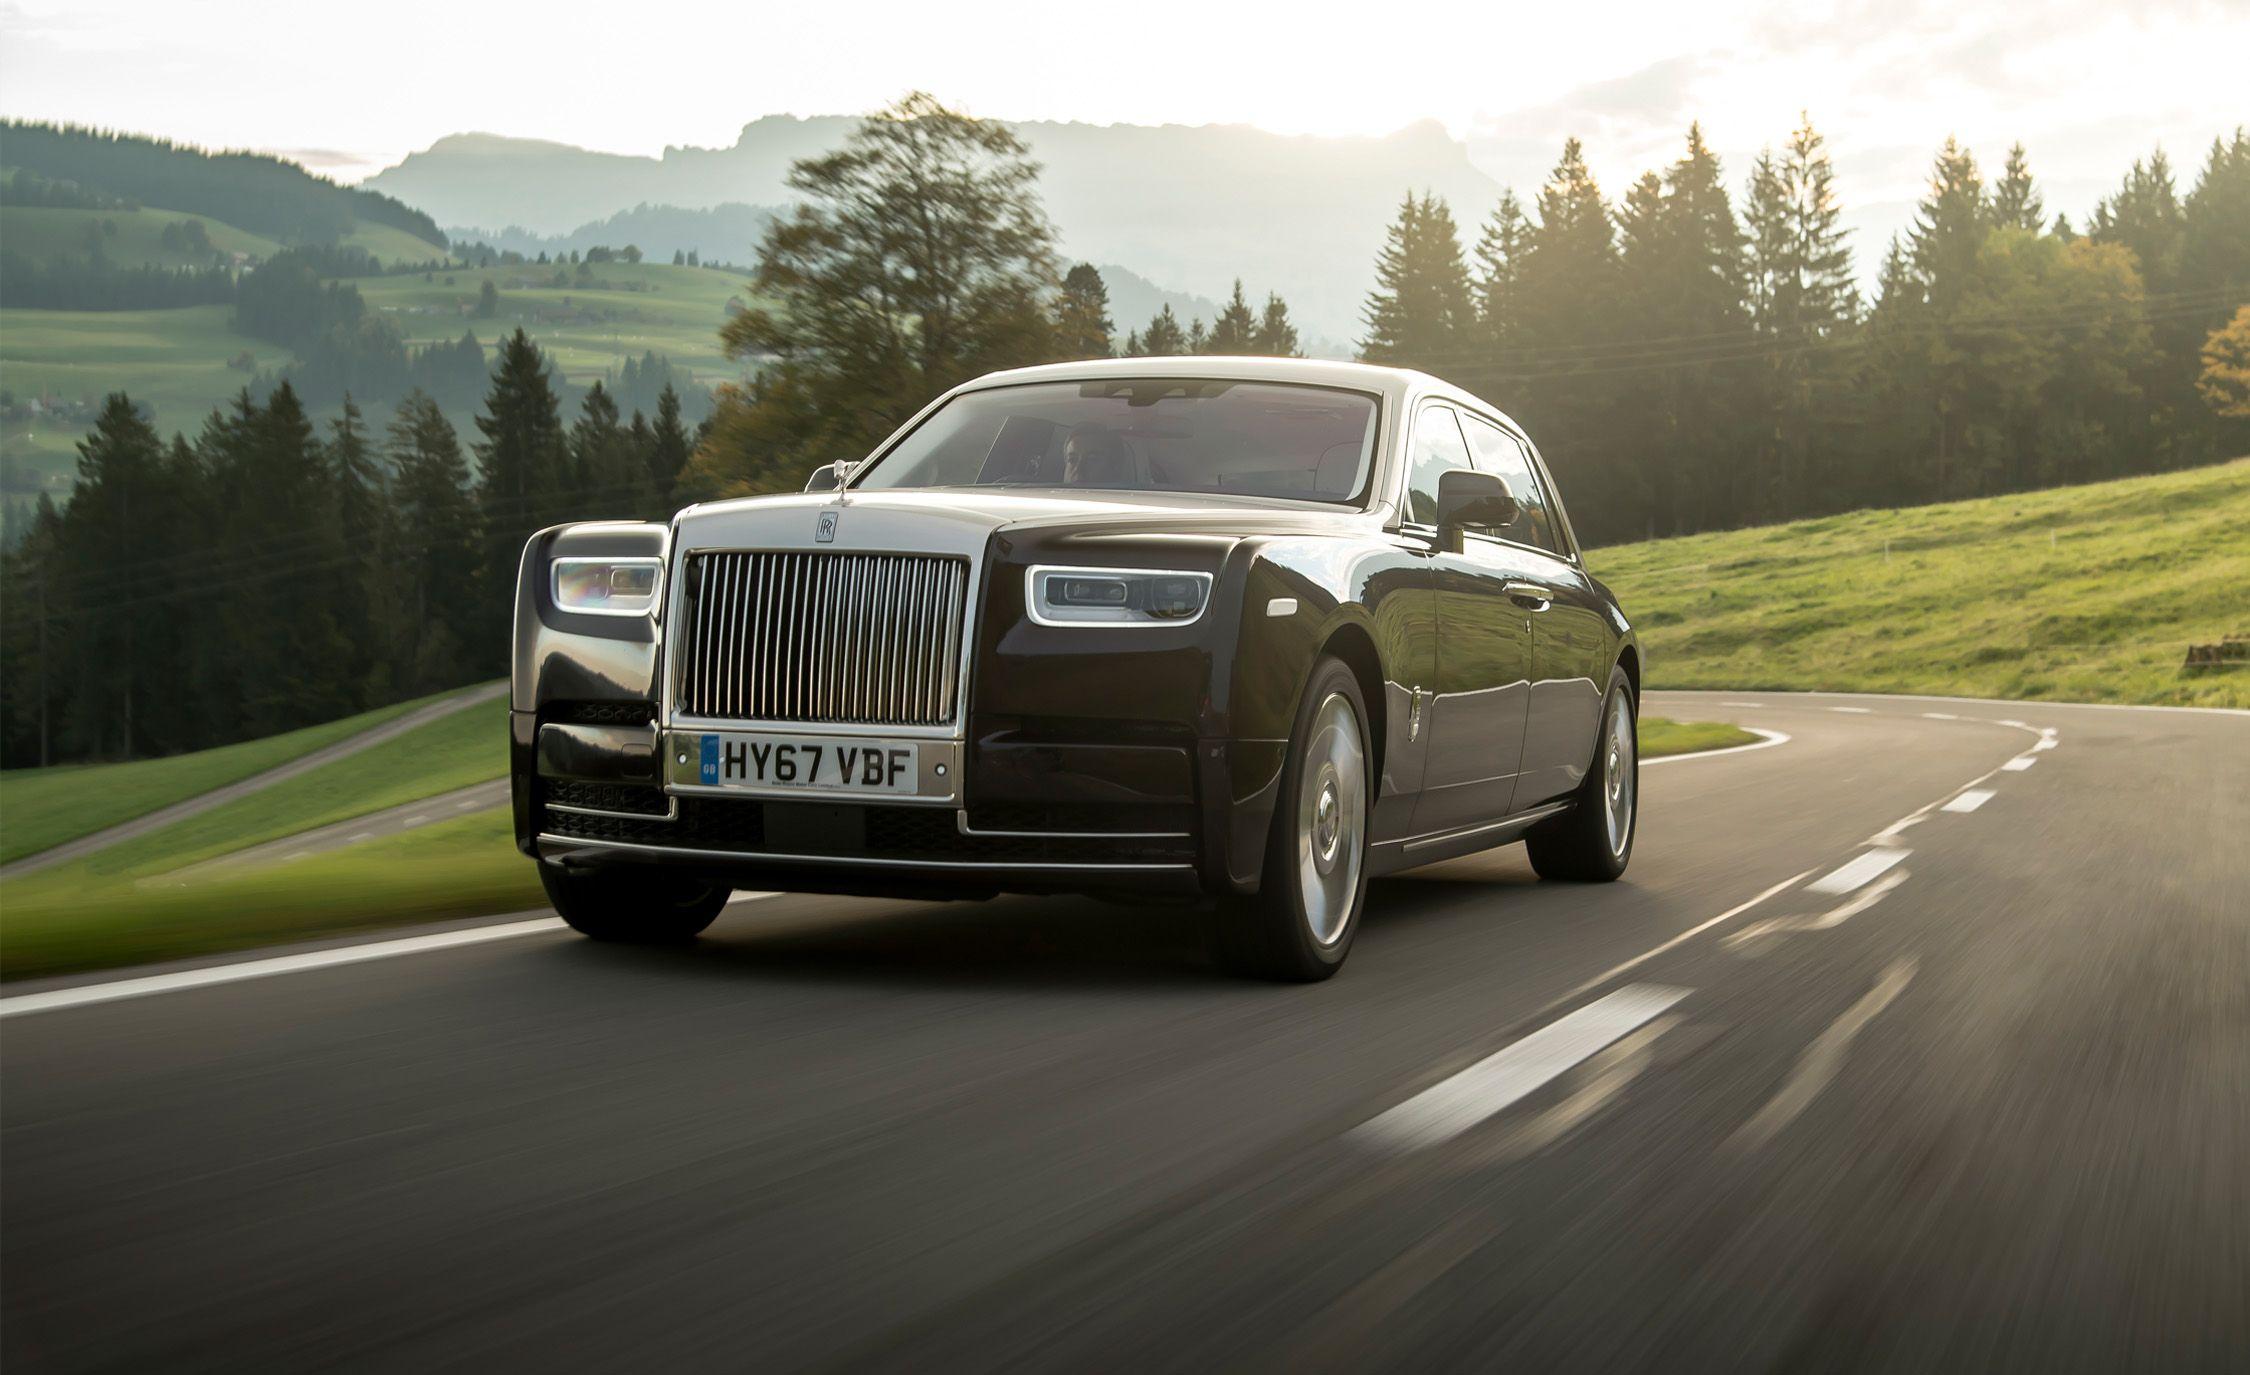 Royal Rise Car Wallpapers 2019 Rolls Royce Phantom Reviews Rolls Royce Phantom